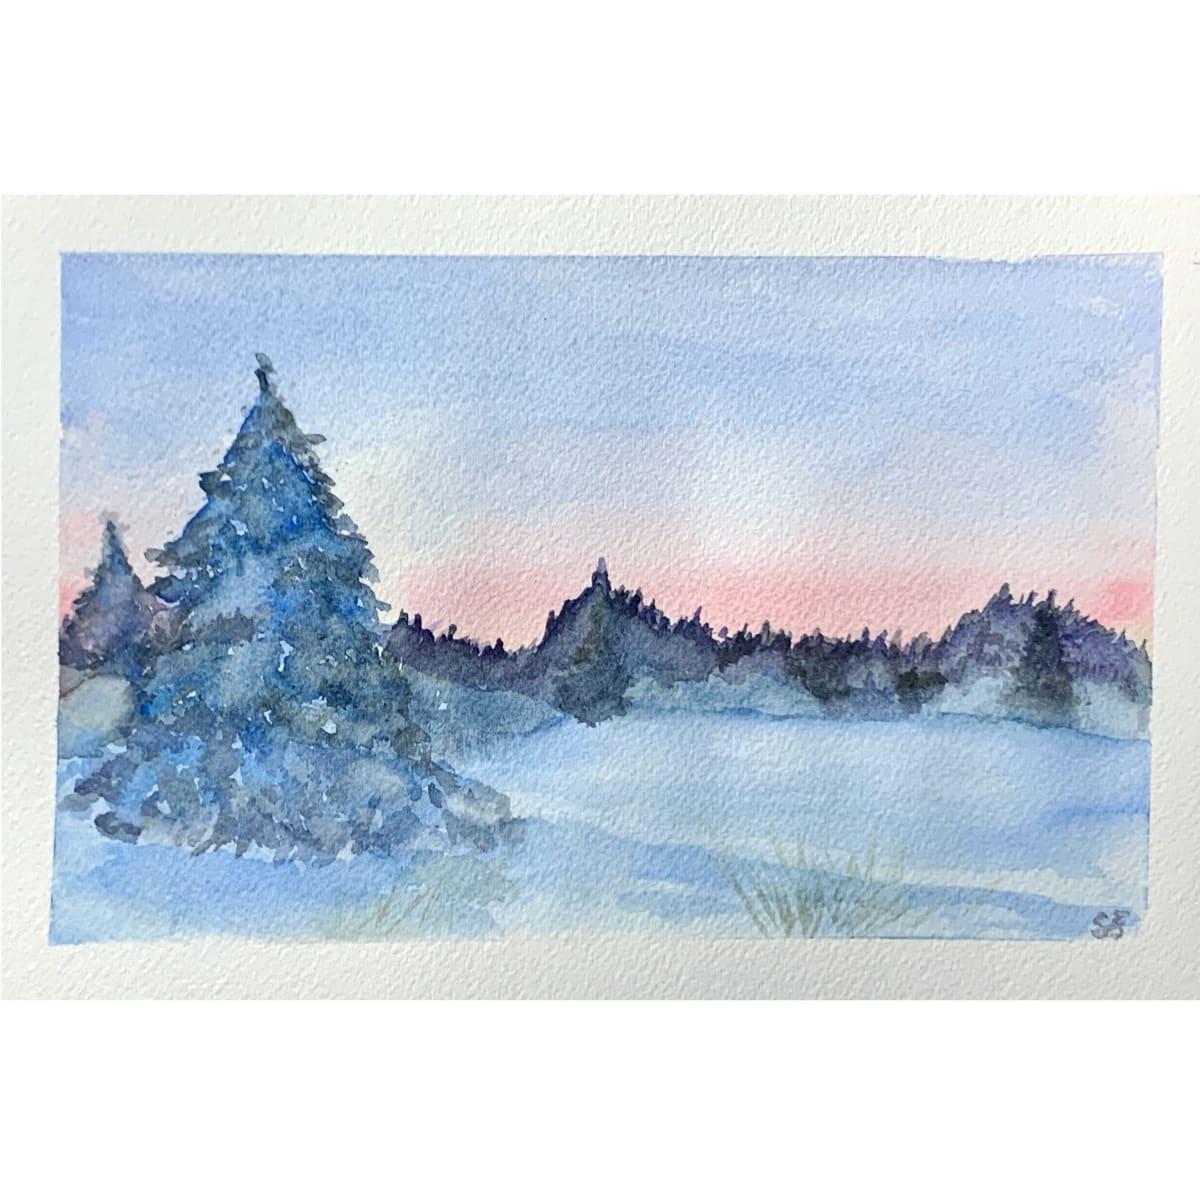 Blue Christmas by Susi Schuele